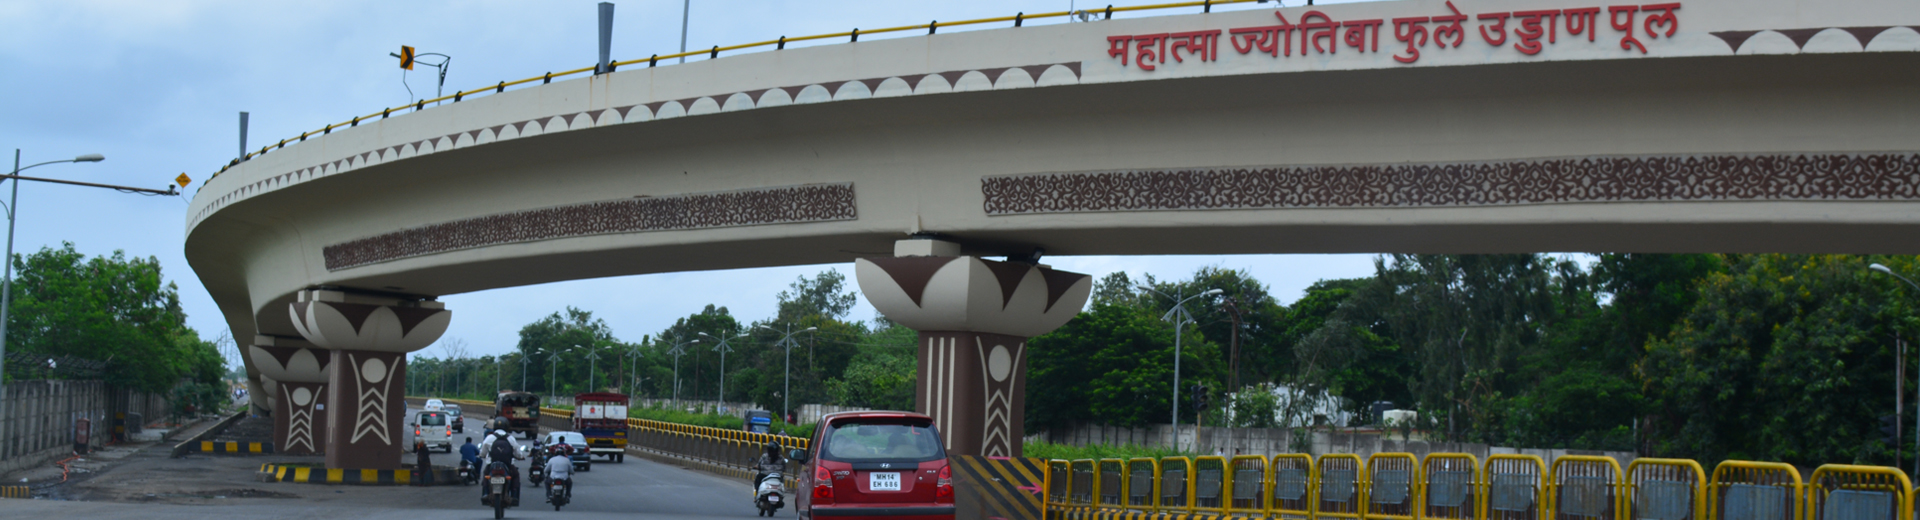 Hdfc Bank Pune – IFSC code, MICR code & Branch